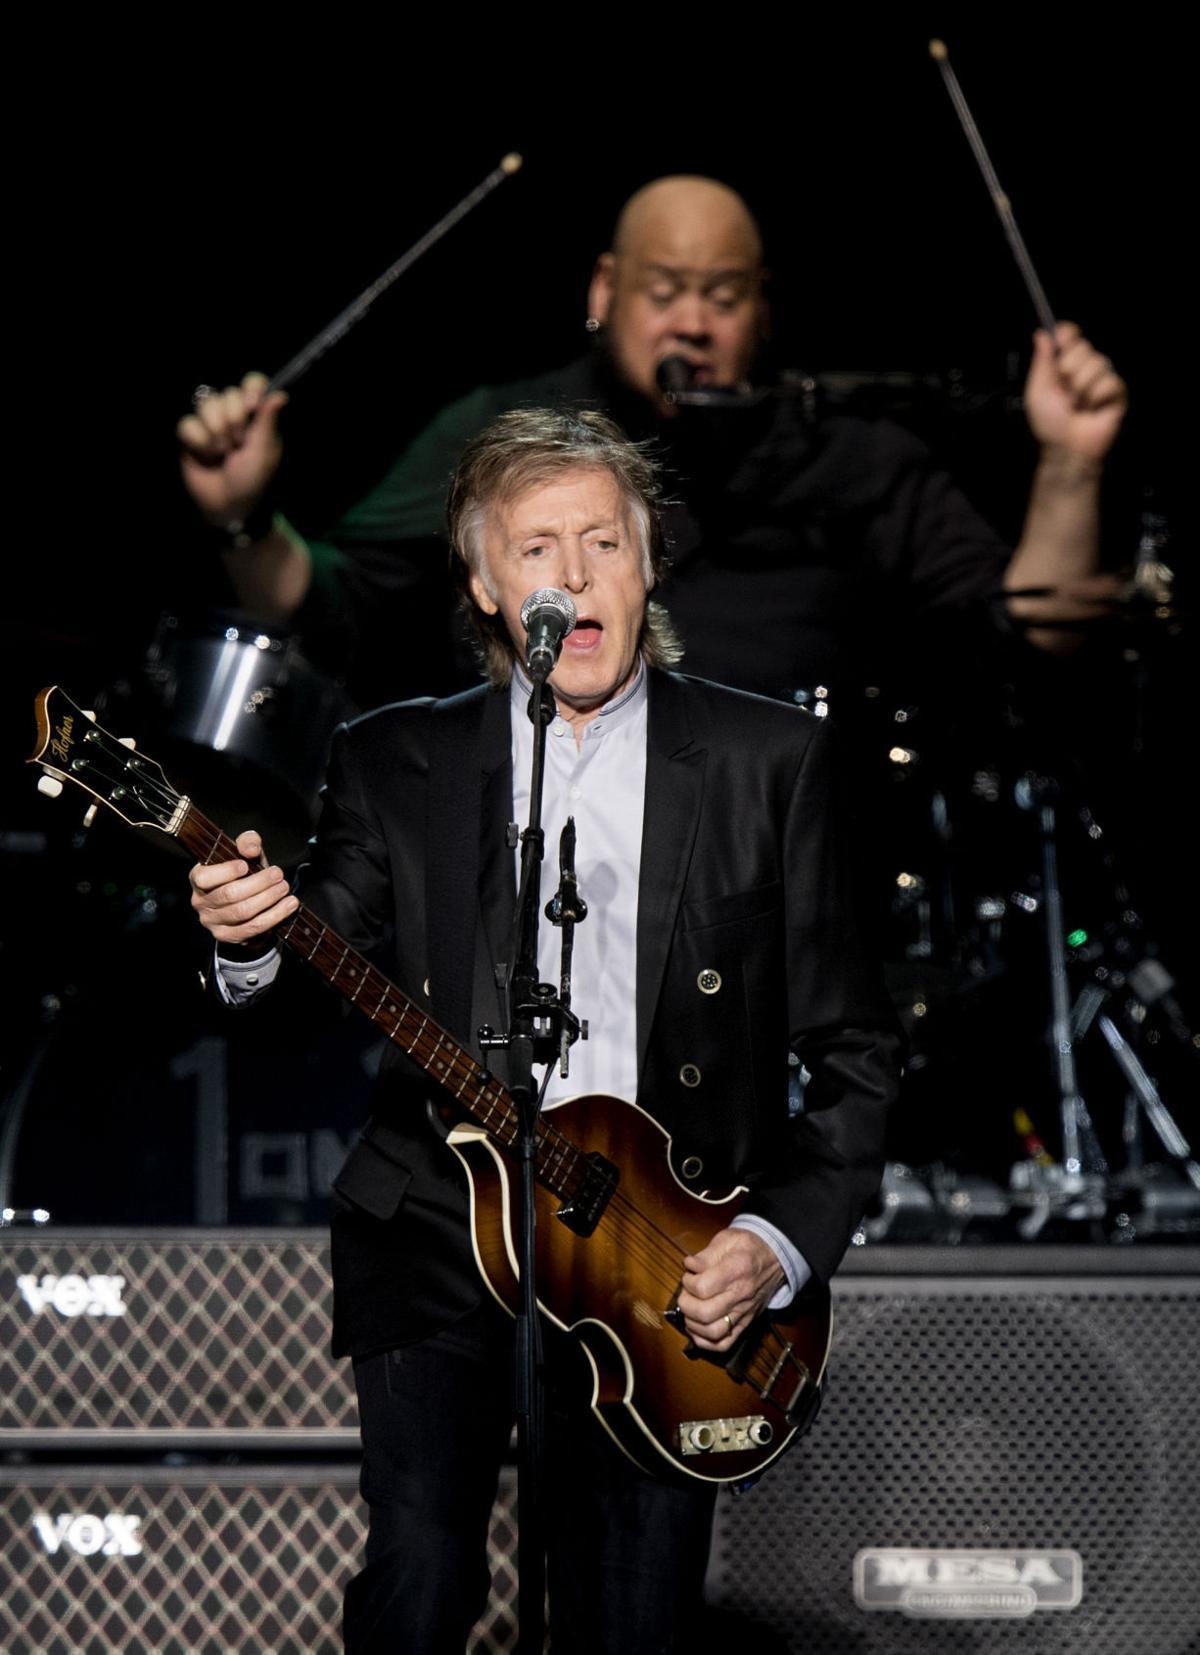 Paul McCartney at the CenturyLink Center in Omaha